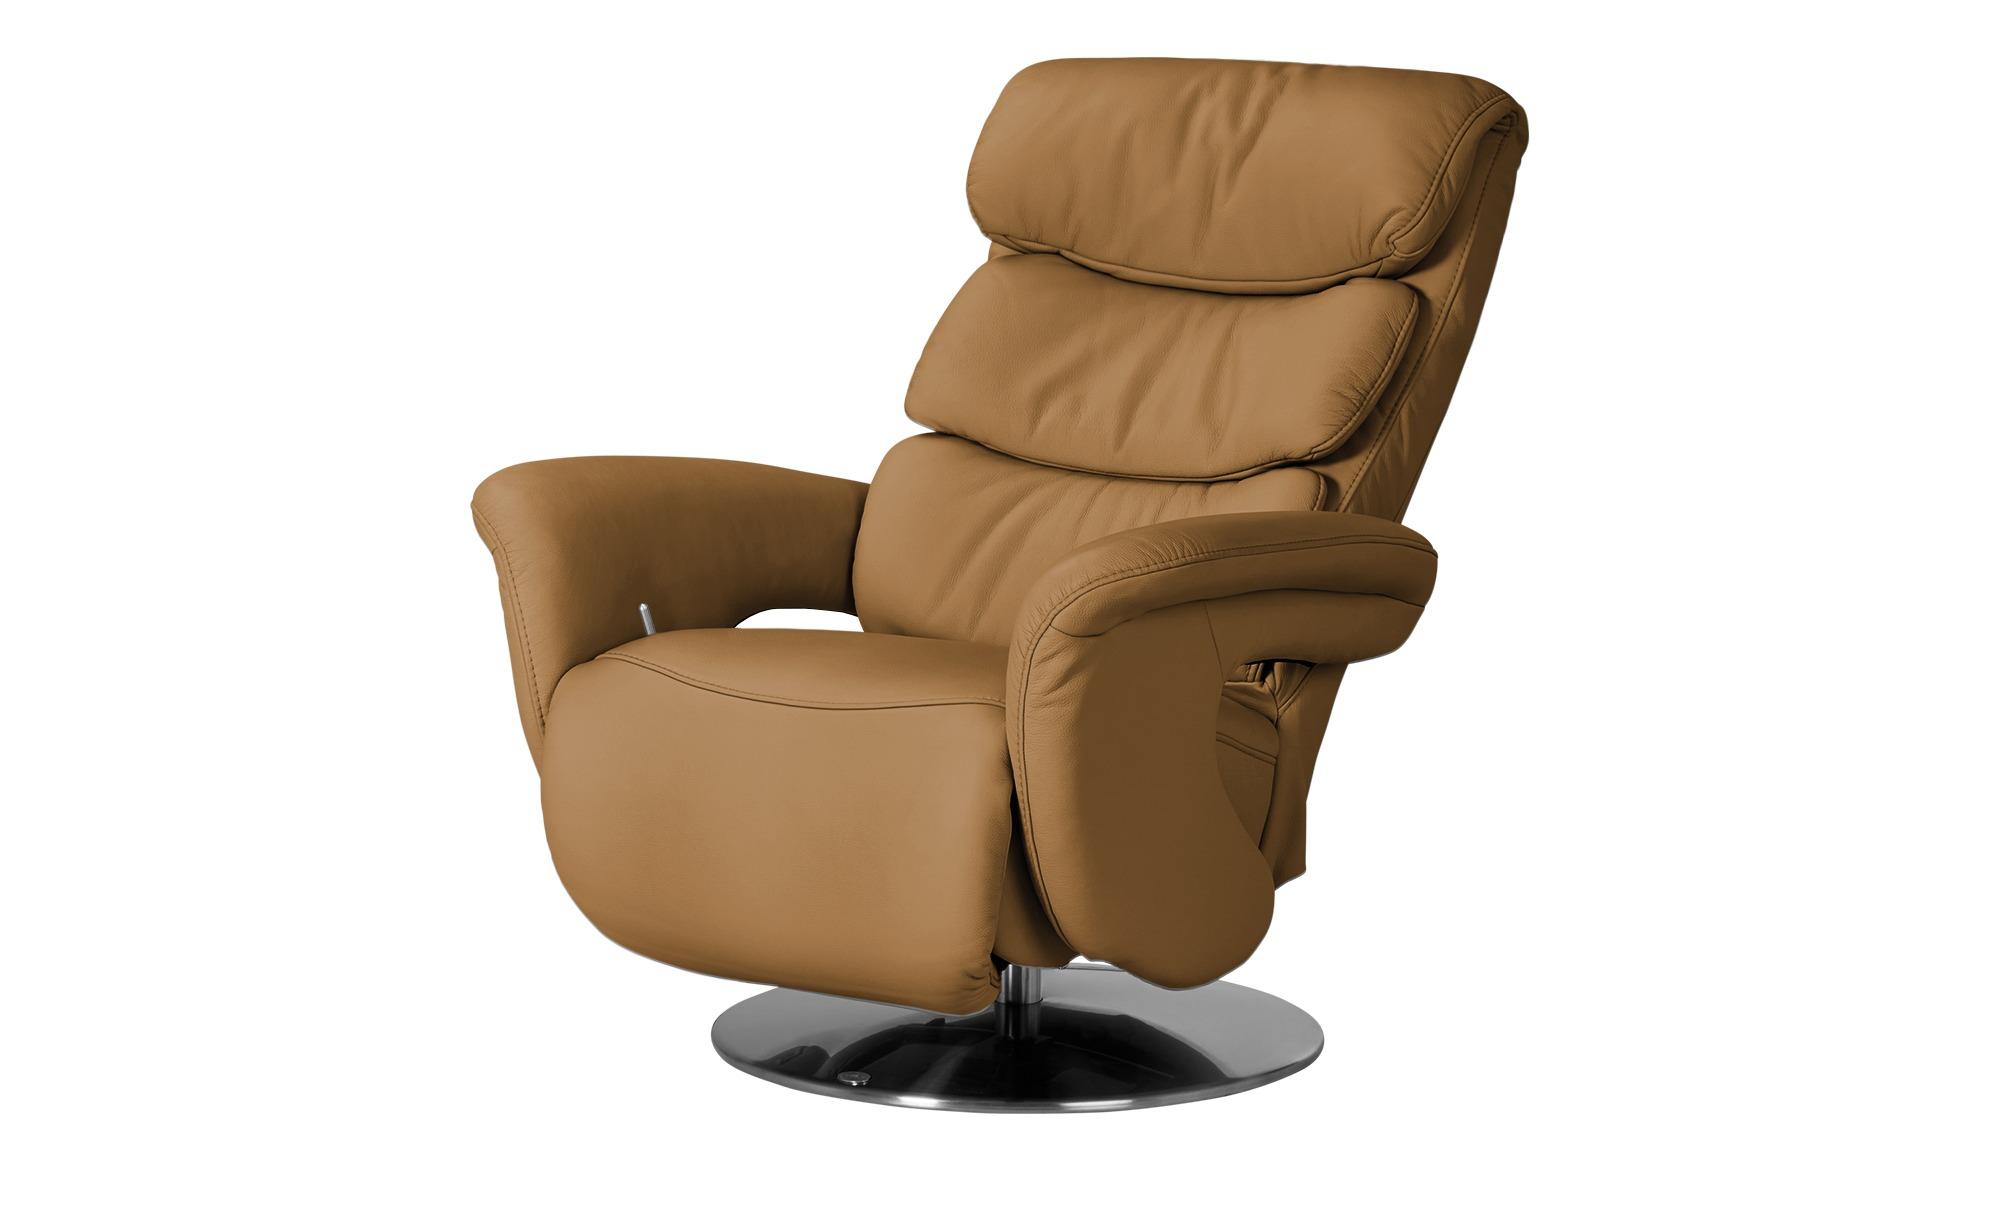 Leder-Relaxsessel gelb - Leder Viktoria ¦ gelb ¦ Maße (cm): B: 83 H: 109 T: 90 Polstermöbel > Sessel > Fernsehsessel - Höffner